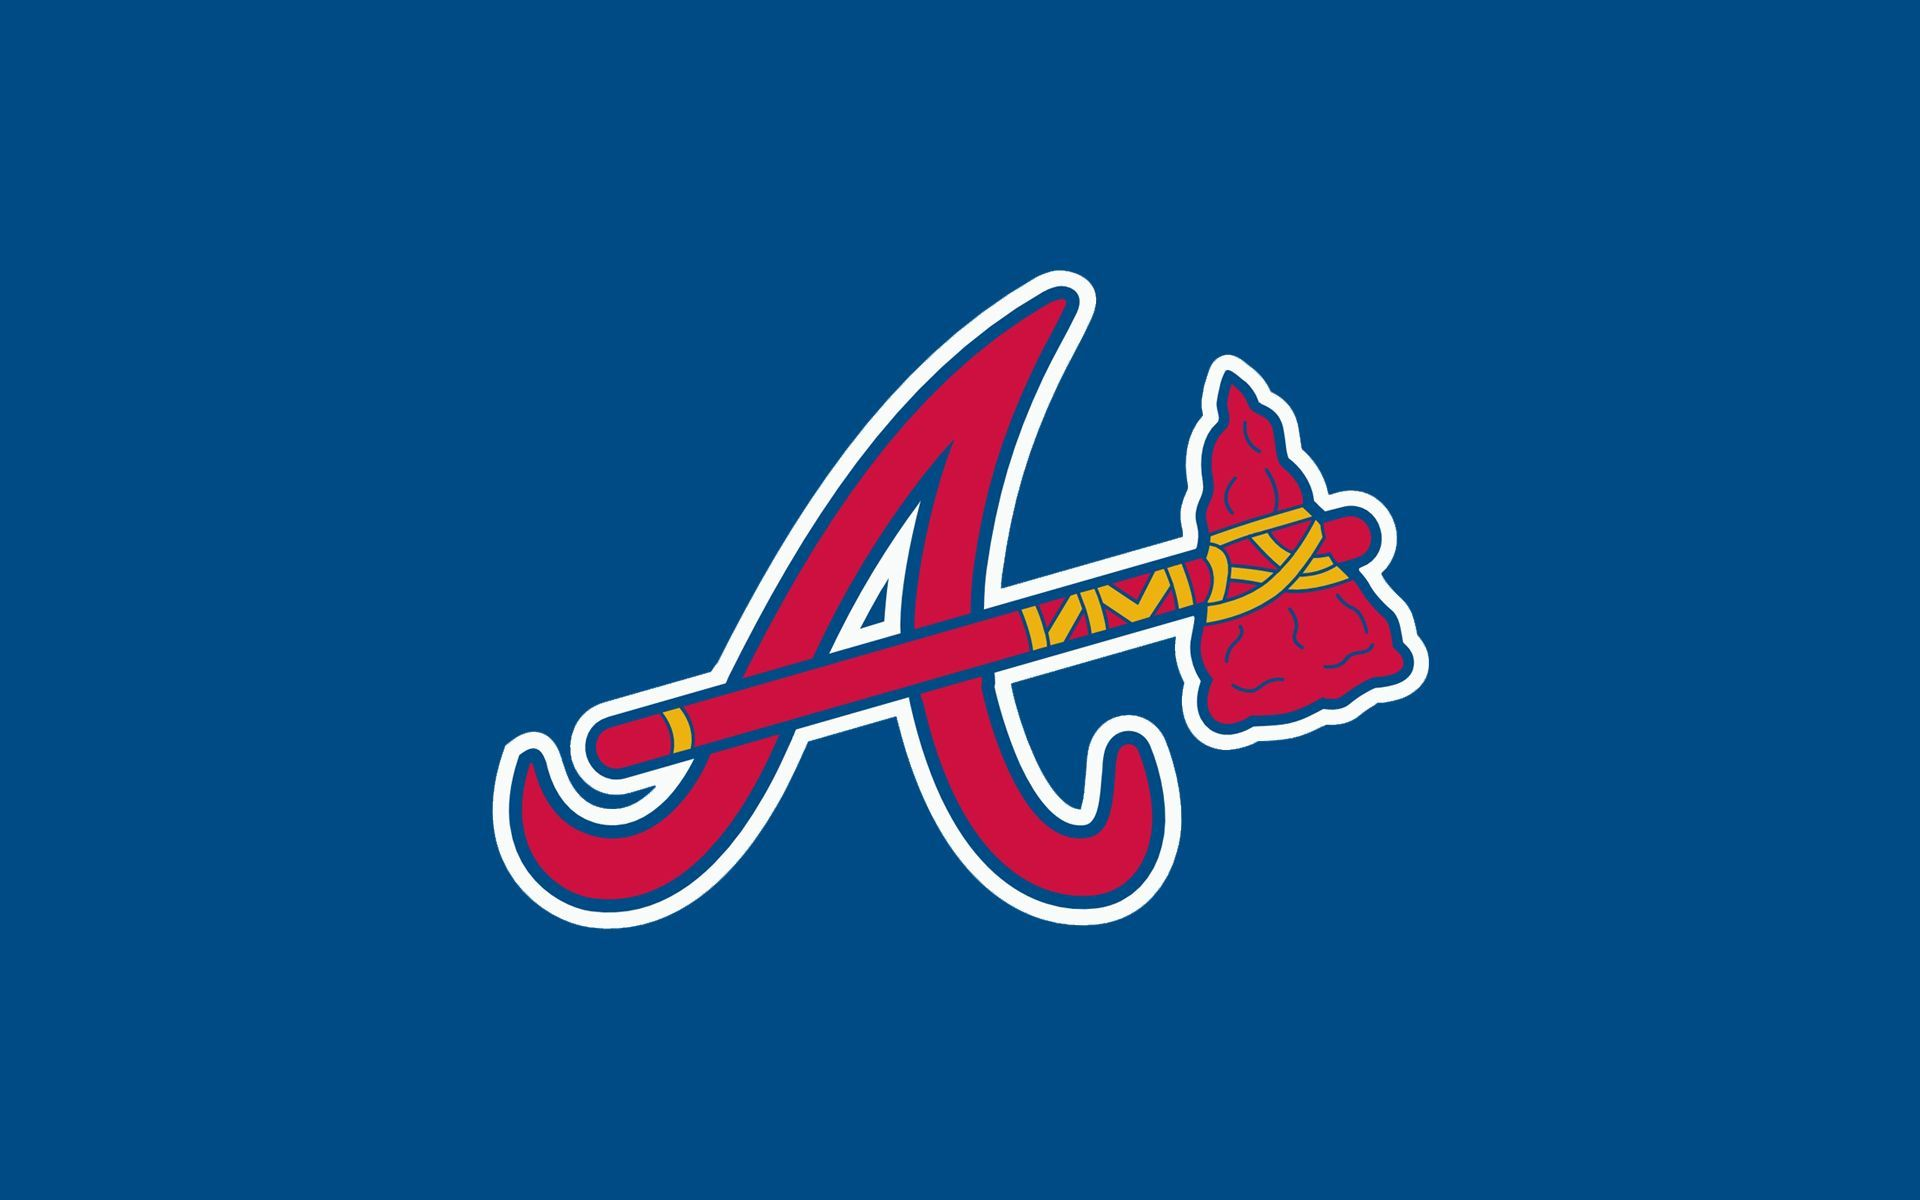 Atlanta Braves Wallpapers Wallpaper Cave In 2020 Atlanta Braves Wallpaper Atlanta Braves Logo Atlanta Braves